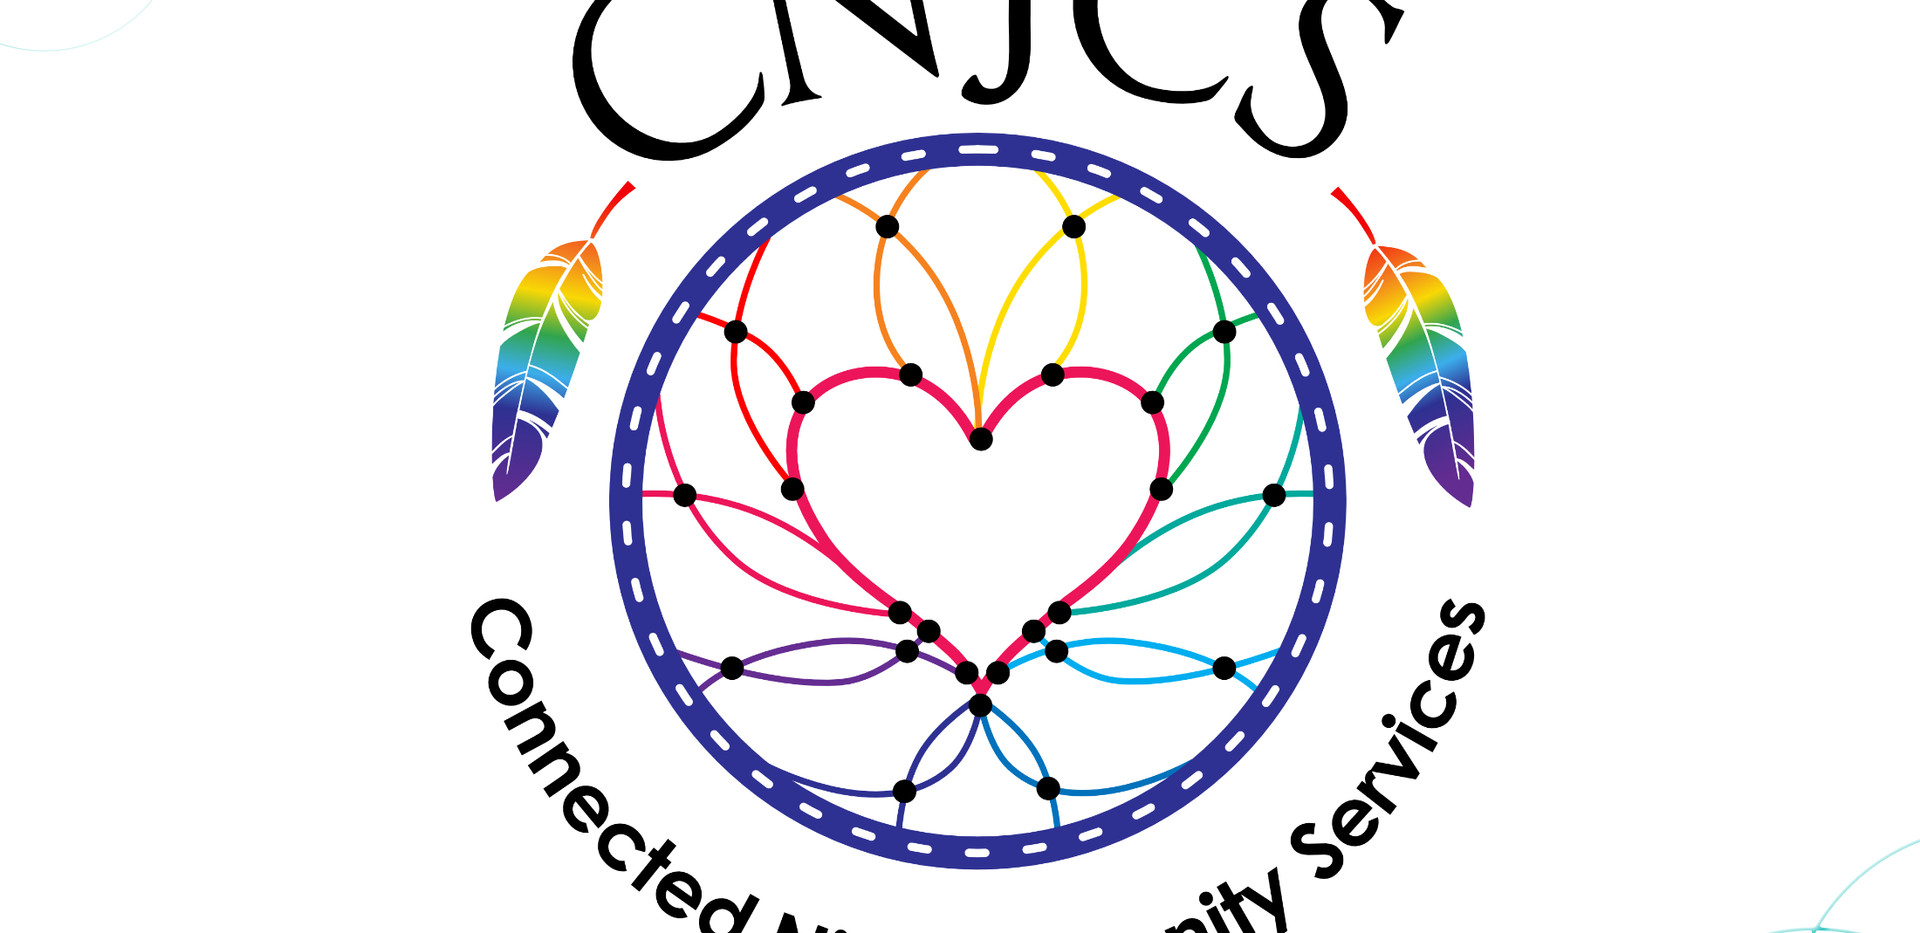 Paul-Micarelli-CNJCS Logo.jpg